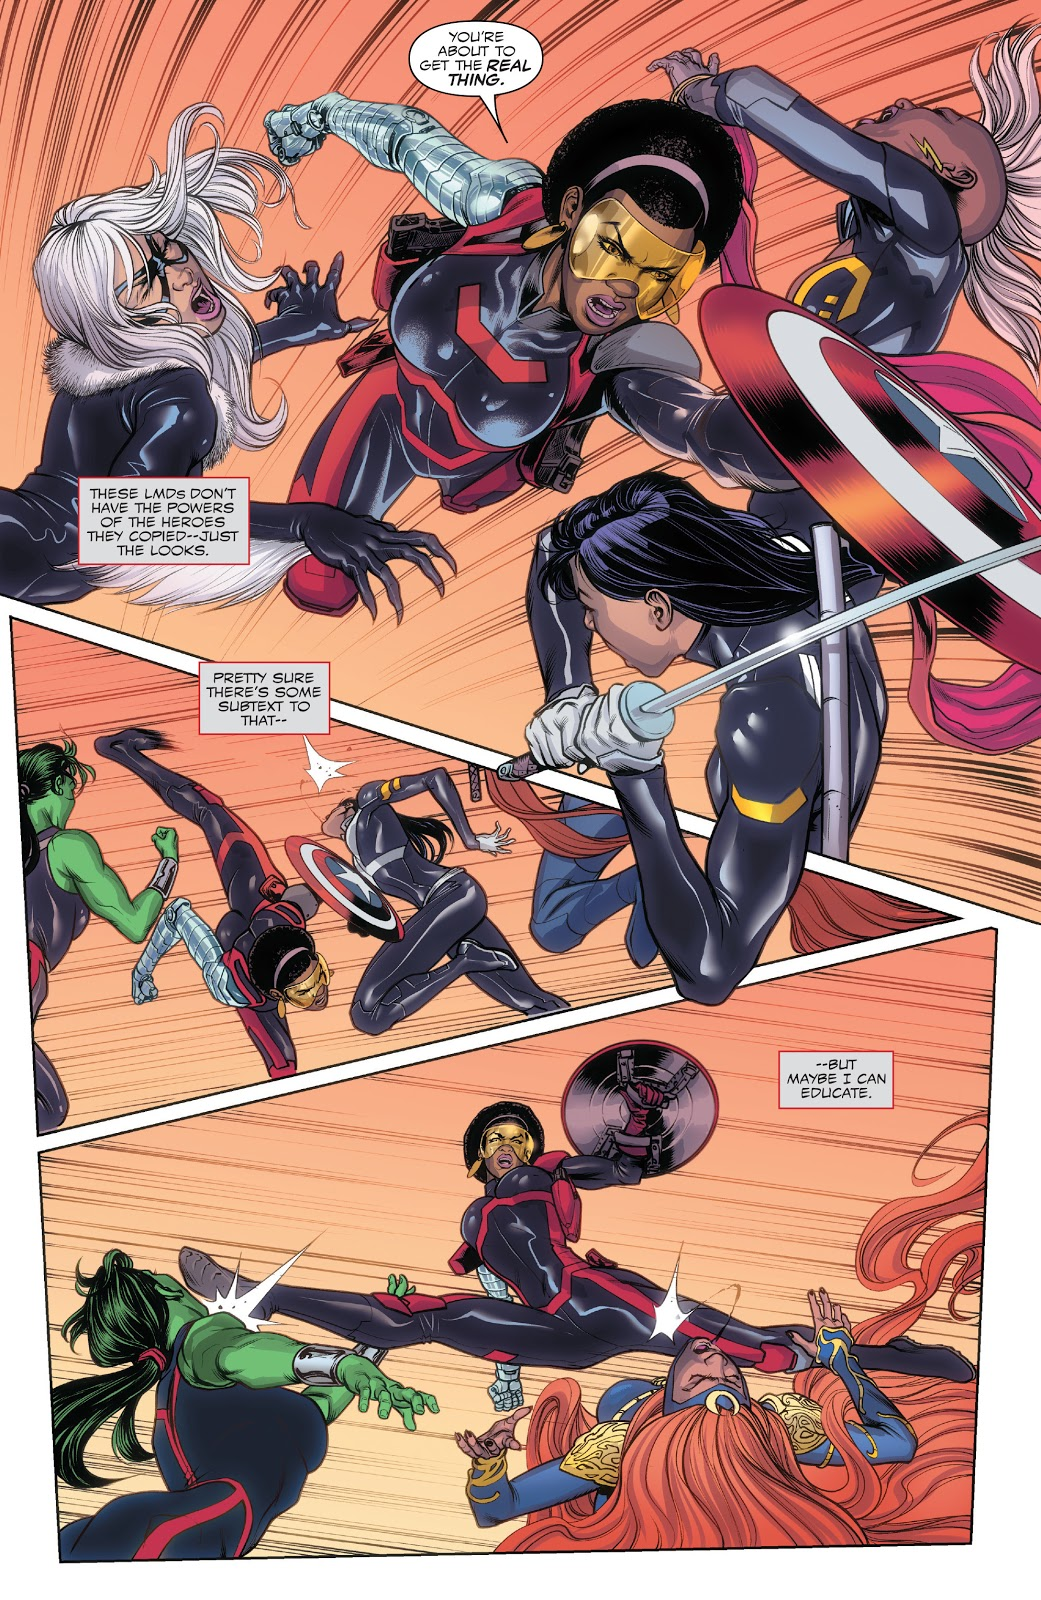 Misty Knight Uses Captain America's Shield